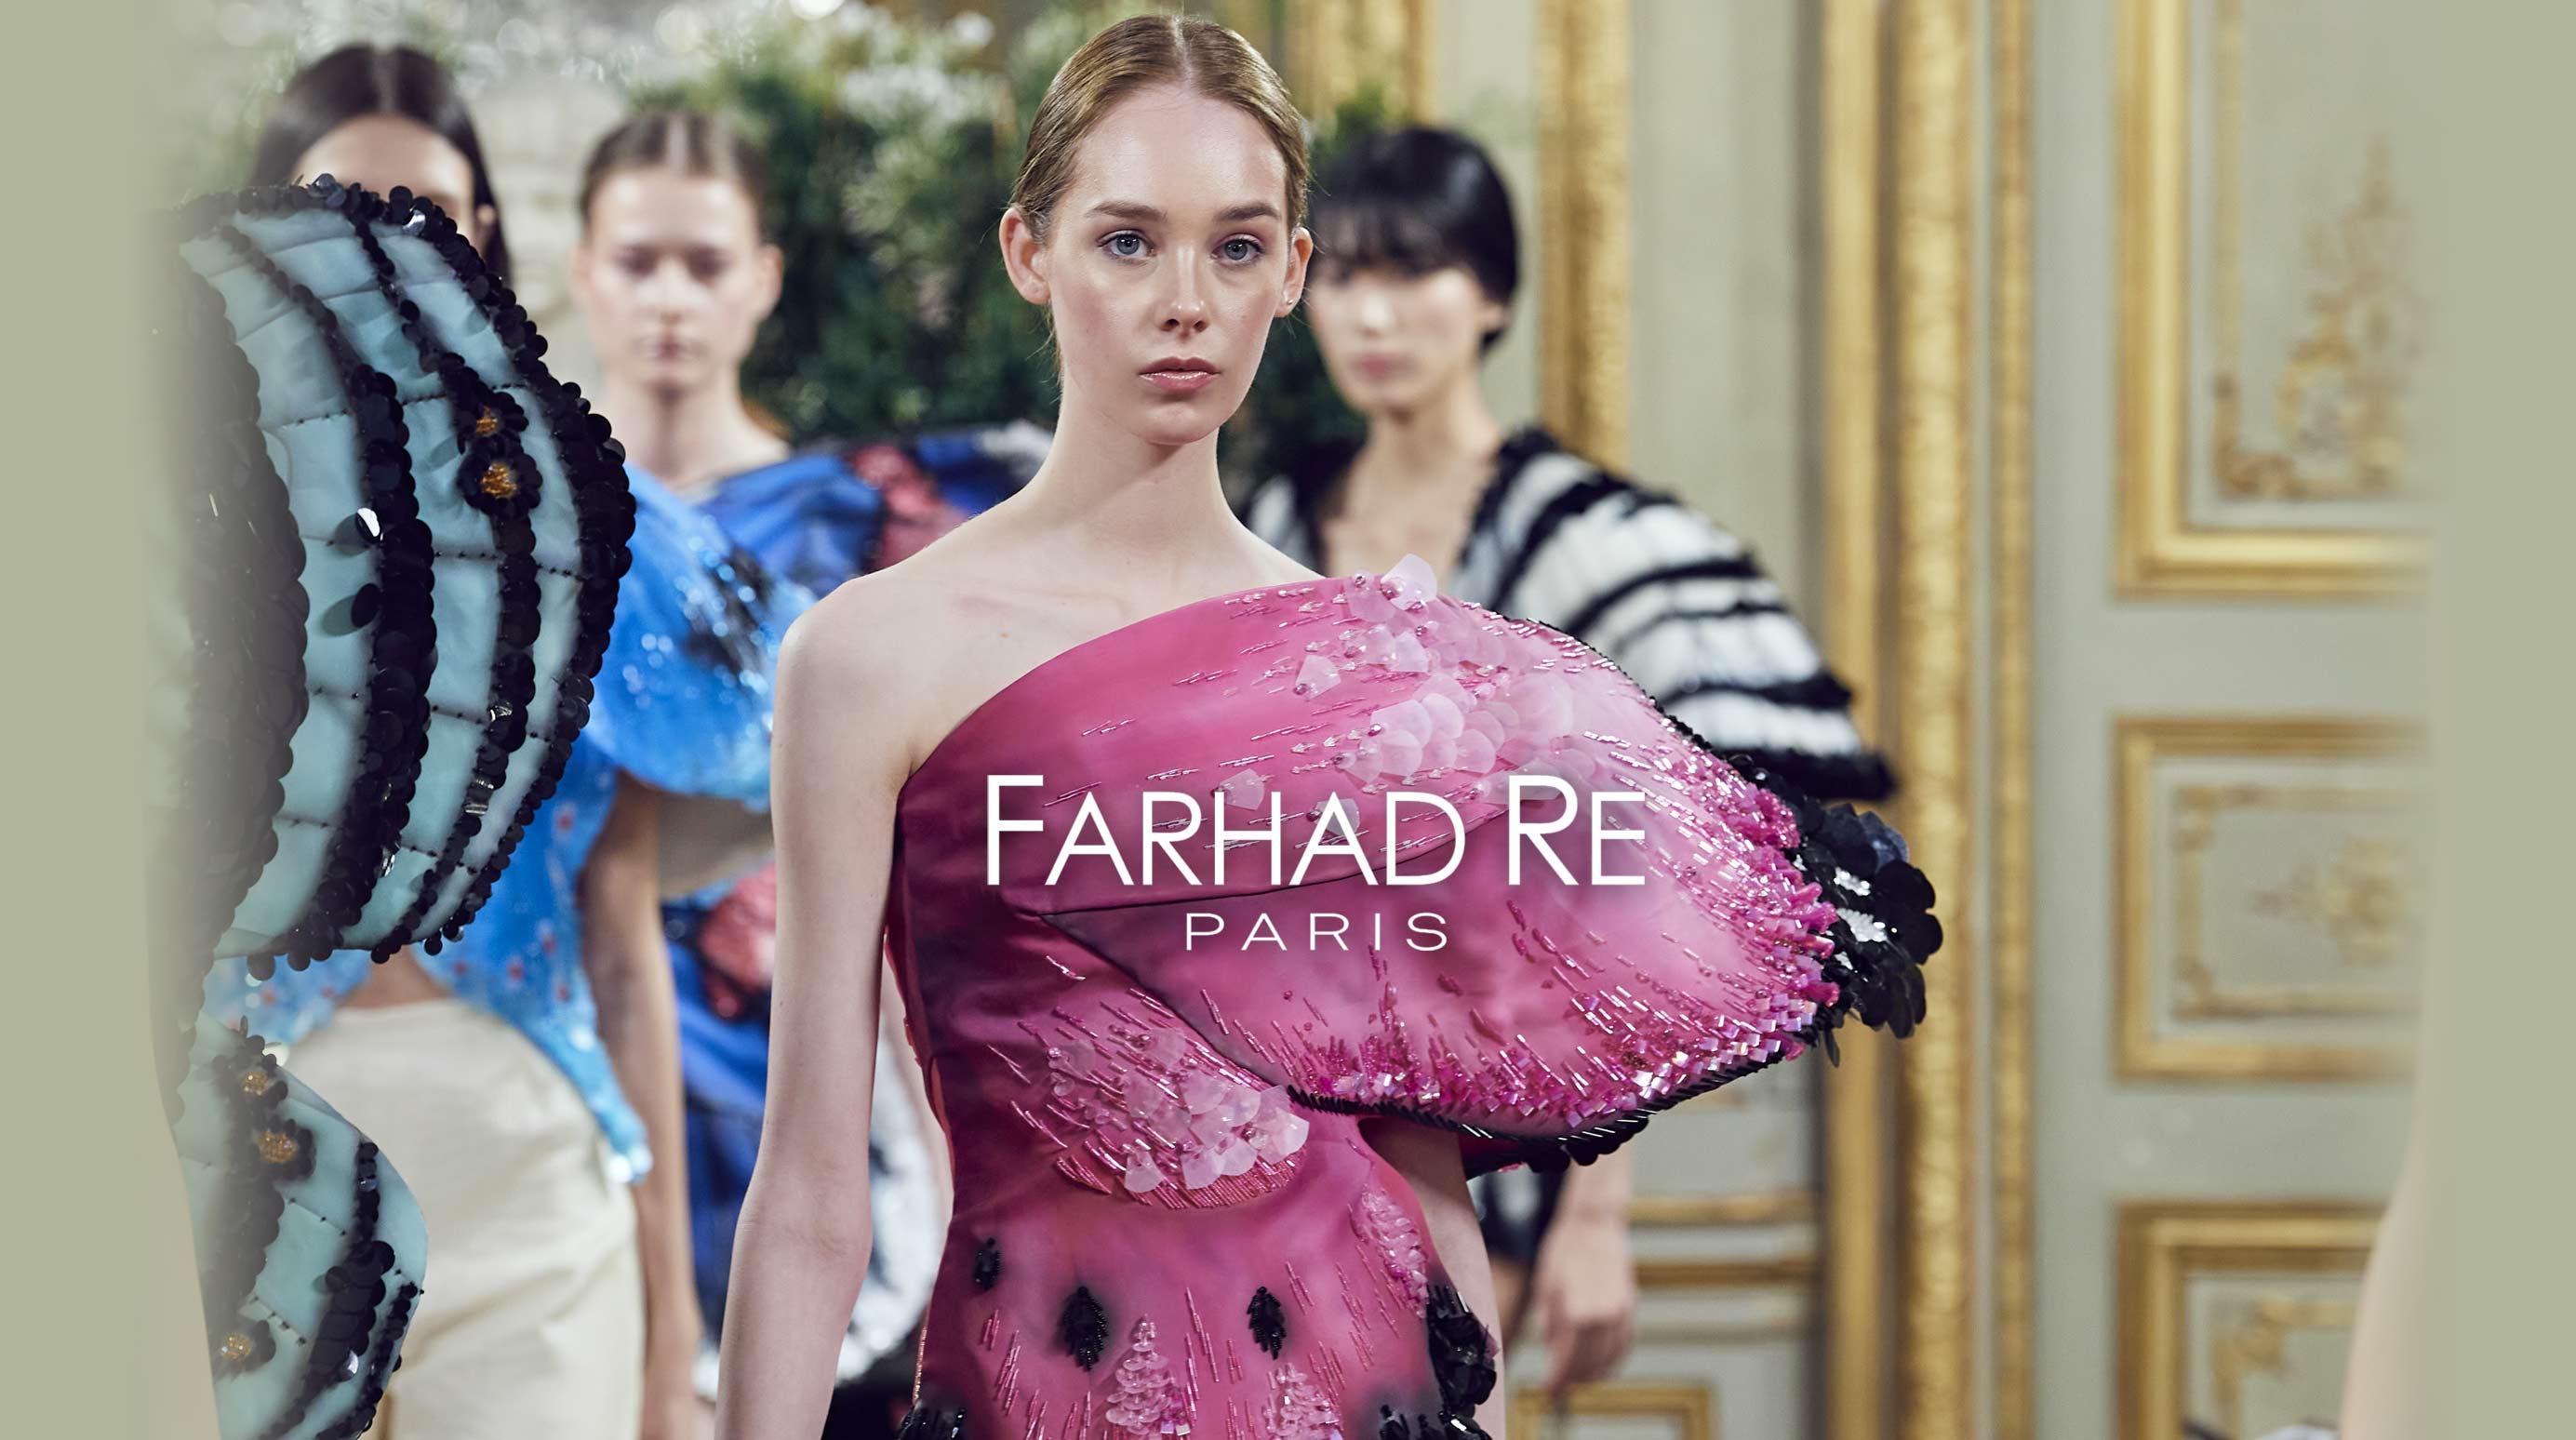 Farhad_re_home_low2